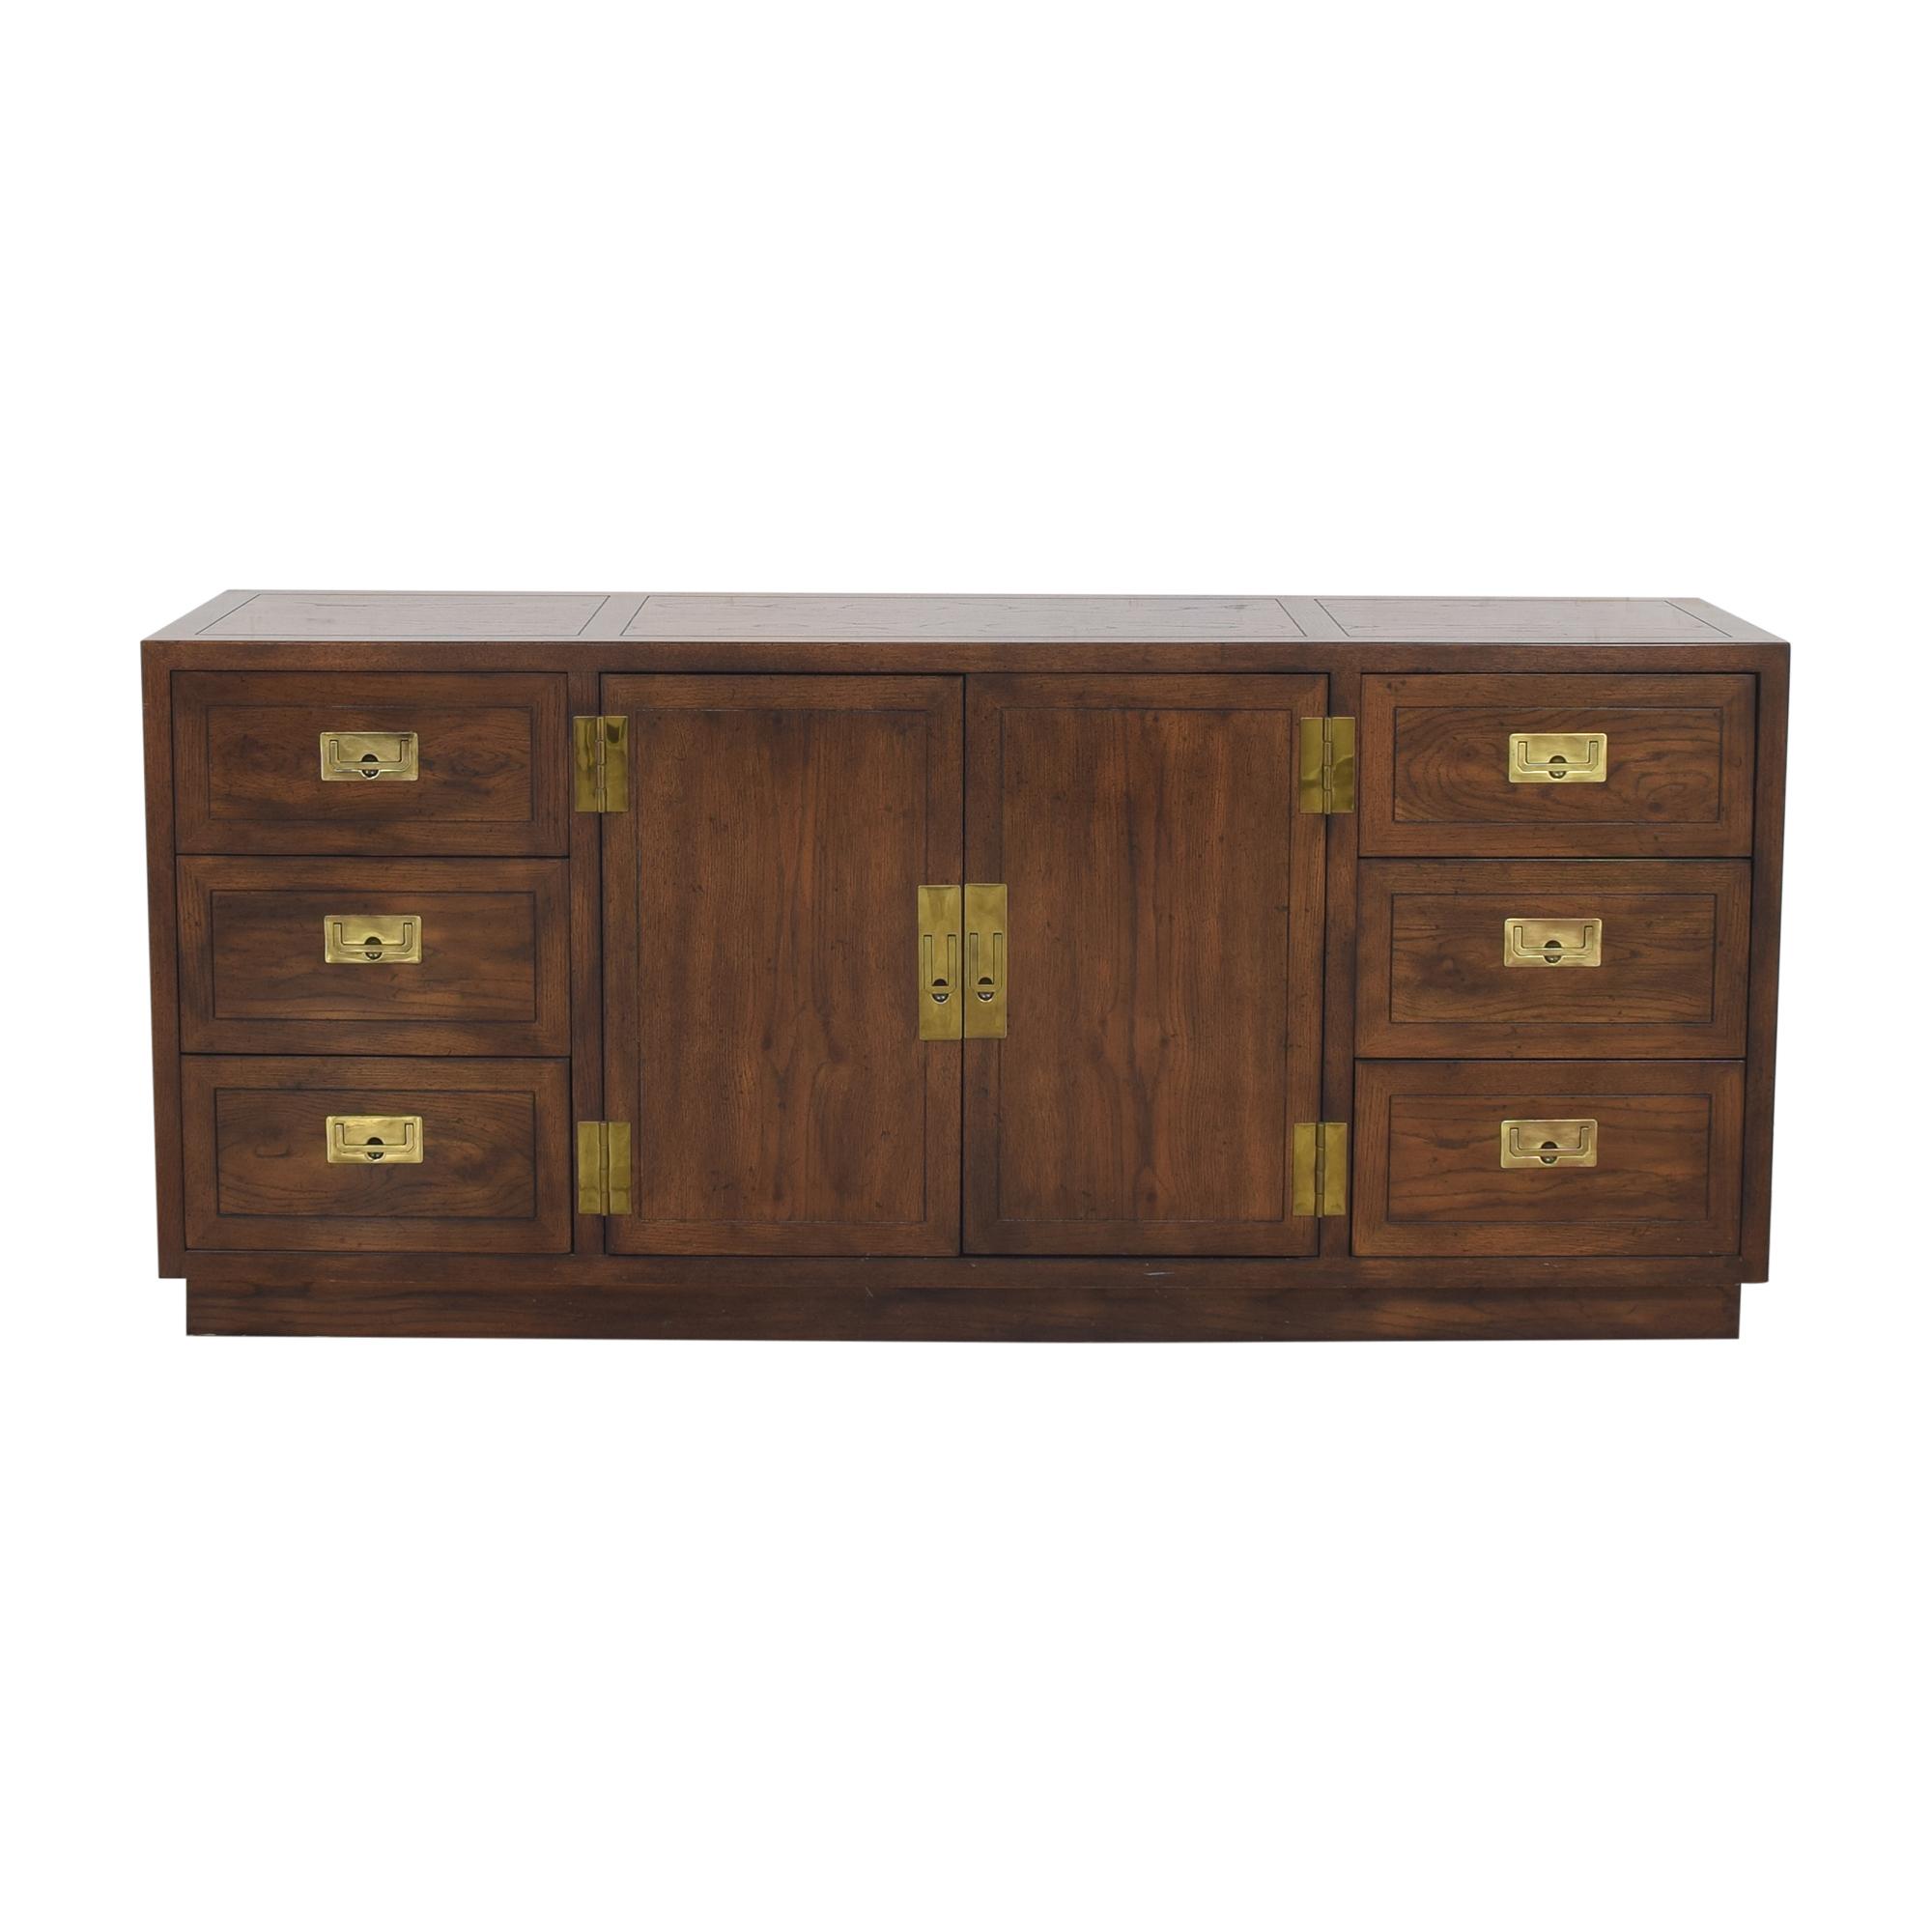 buy Henredon Campaign Style Sideboard Henredon Furniture Cabinets & Sideboards